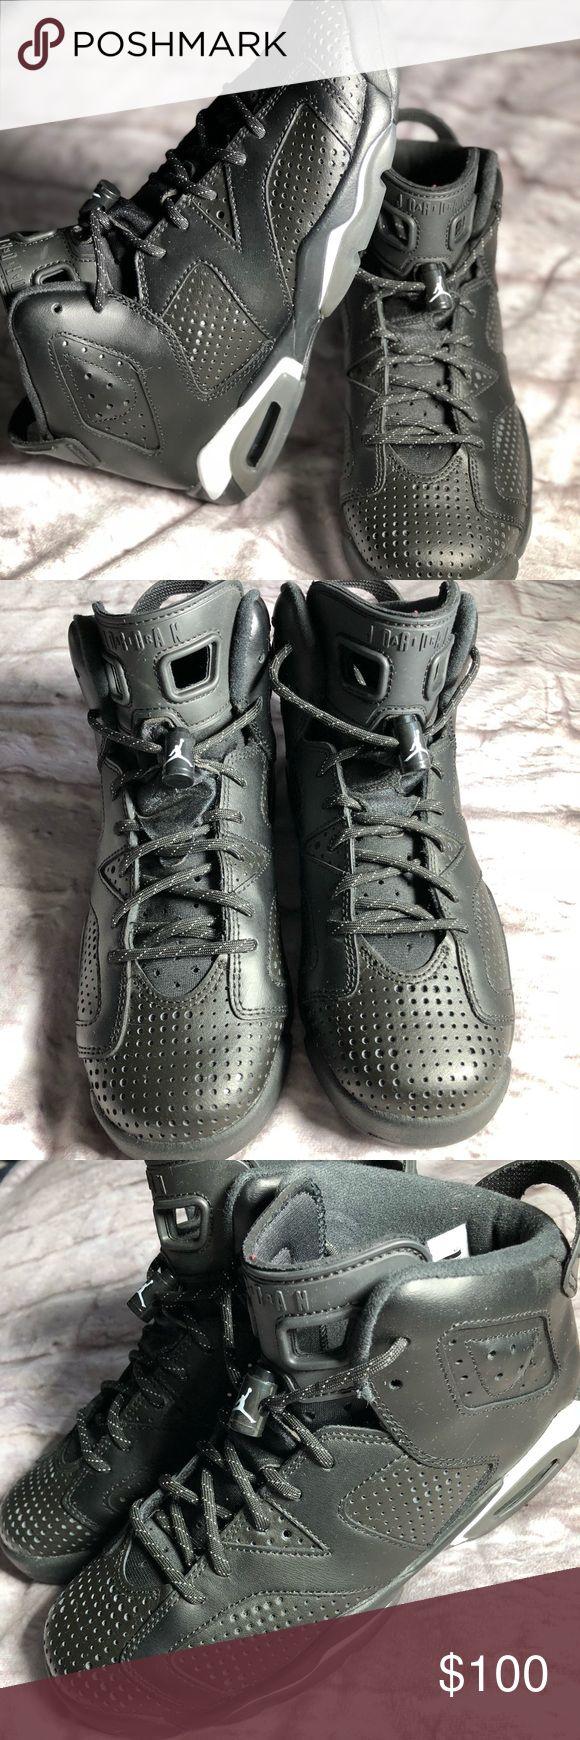 Air Jordan 6 Retro GS 'Black Cat' 6.5Y | 8 Women's *Great like new condition* 100% Authentic Jordan Shoes Sneakers